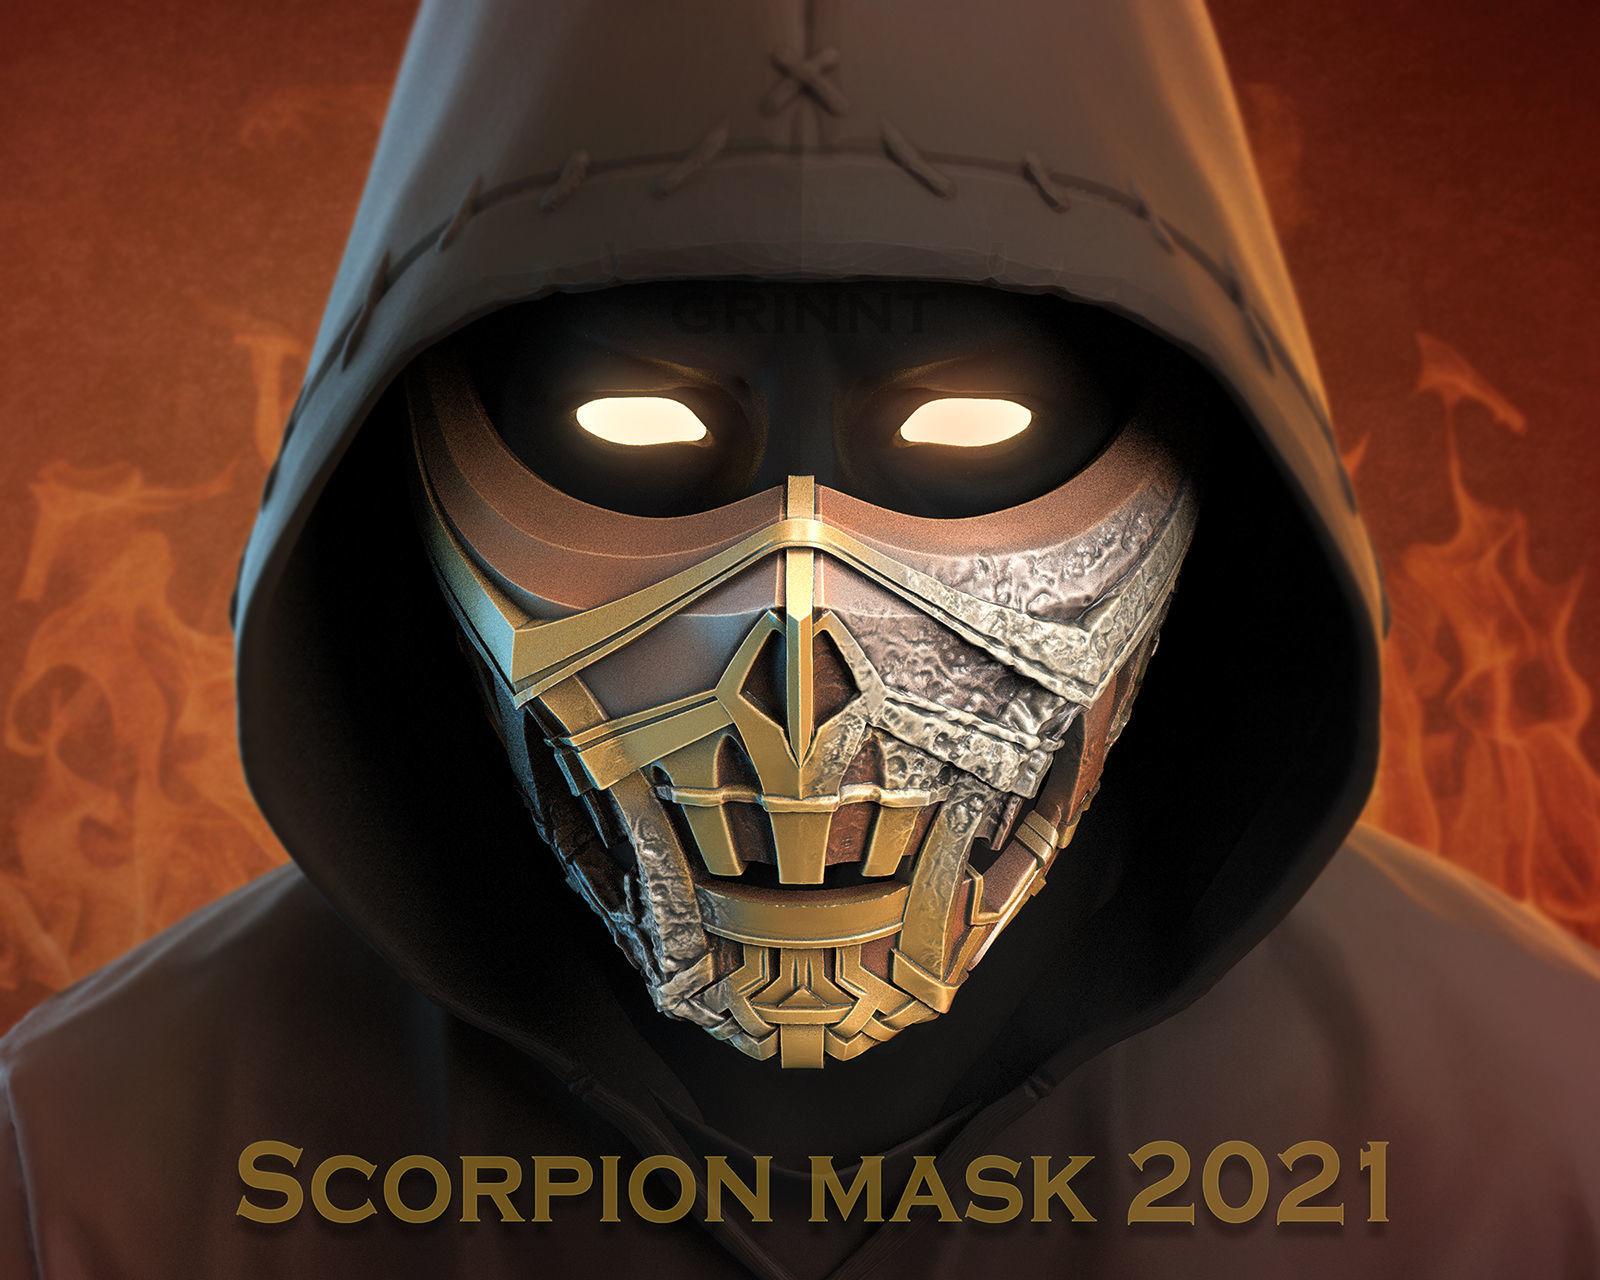 Scorpion mask for face from Mortal Kombat 2021 3D print model